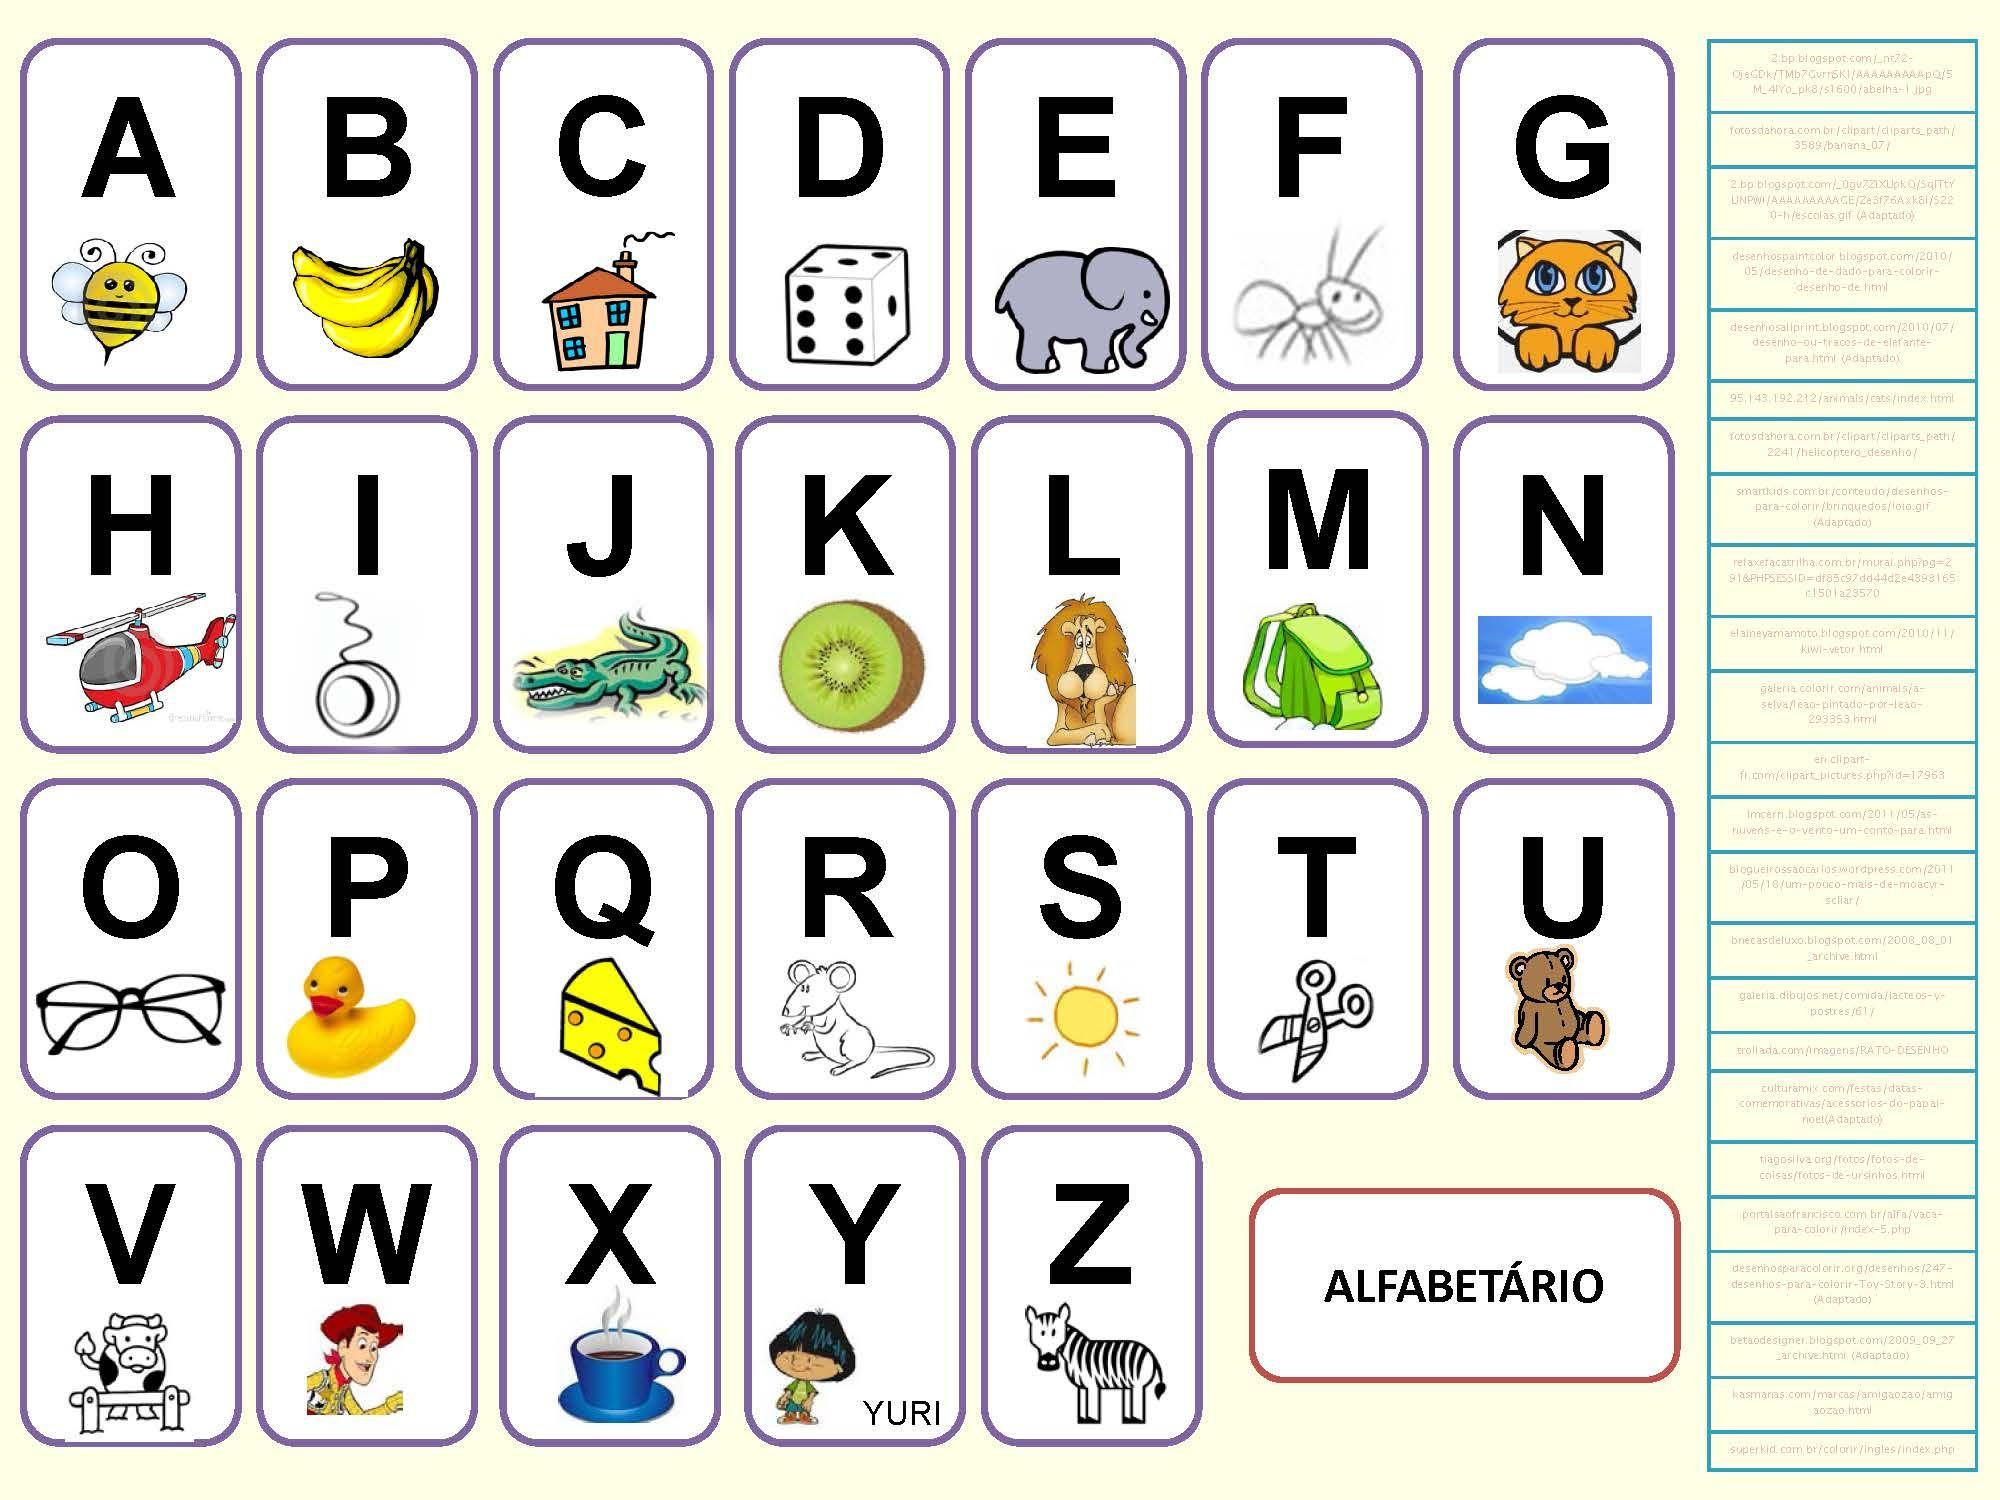 Apprendre Alphabet Maternelle Imprimer Wp32 | Jornalagora destiné J Apprend L Alphabet Maternelle